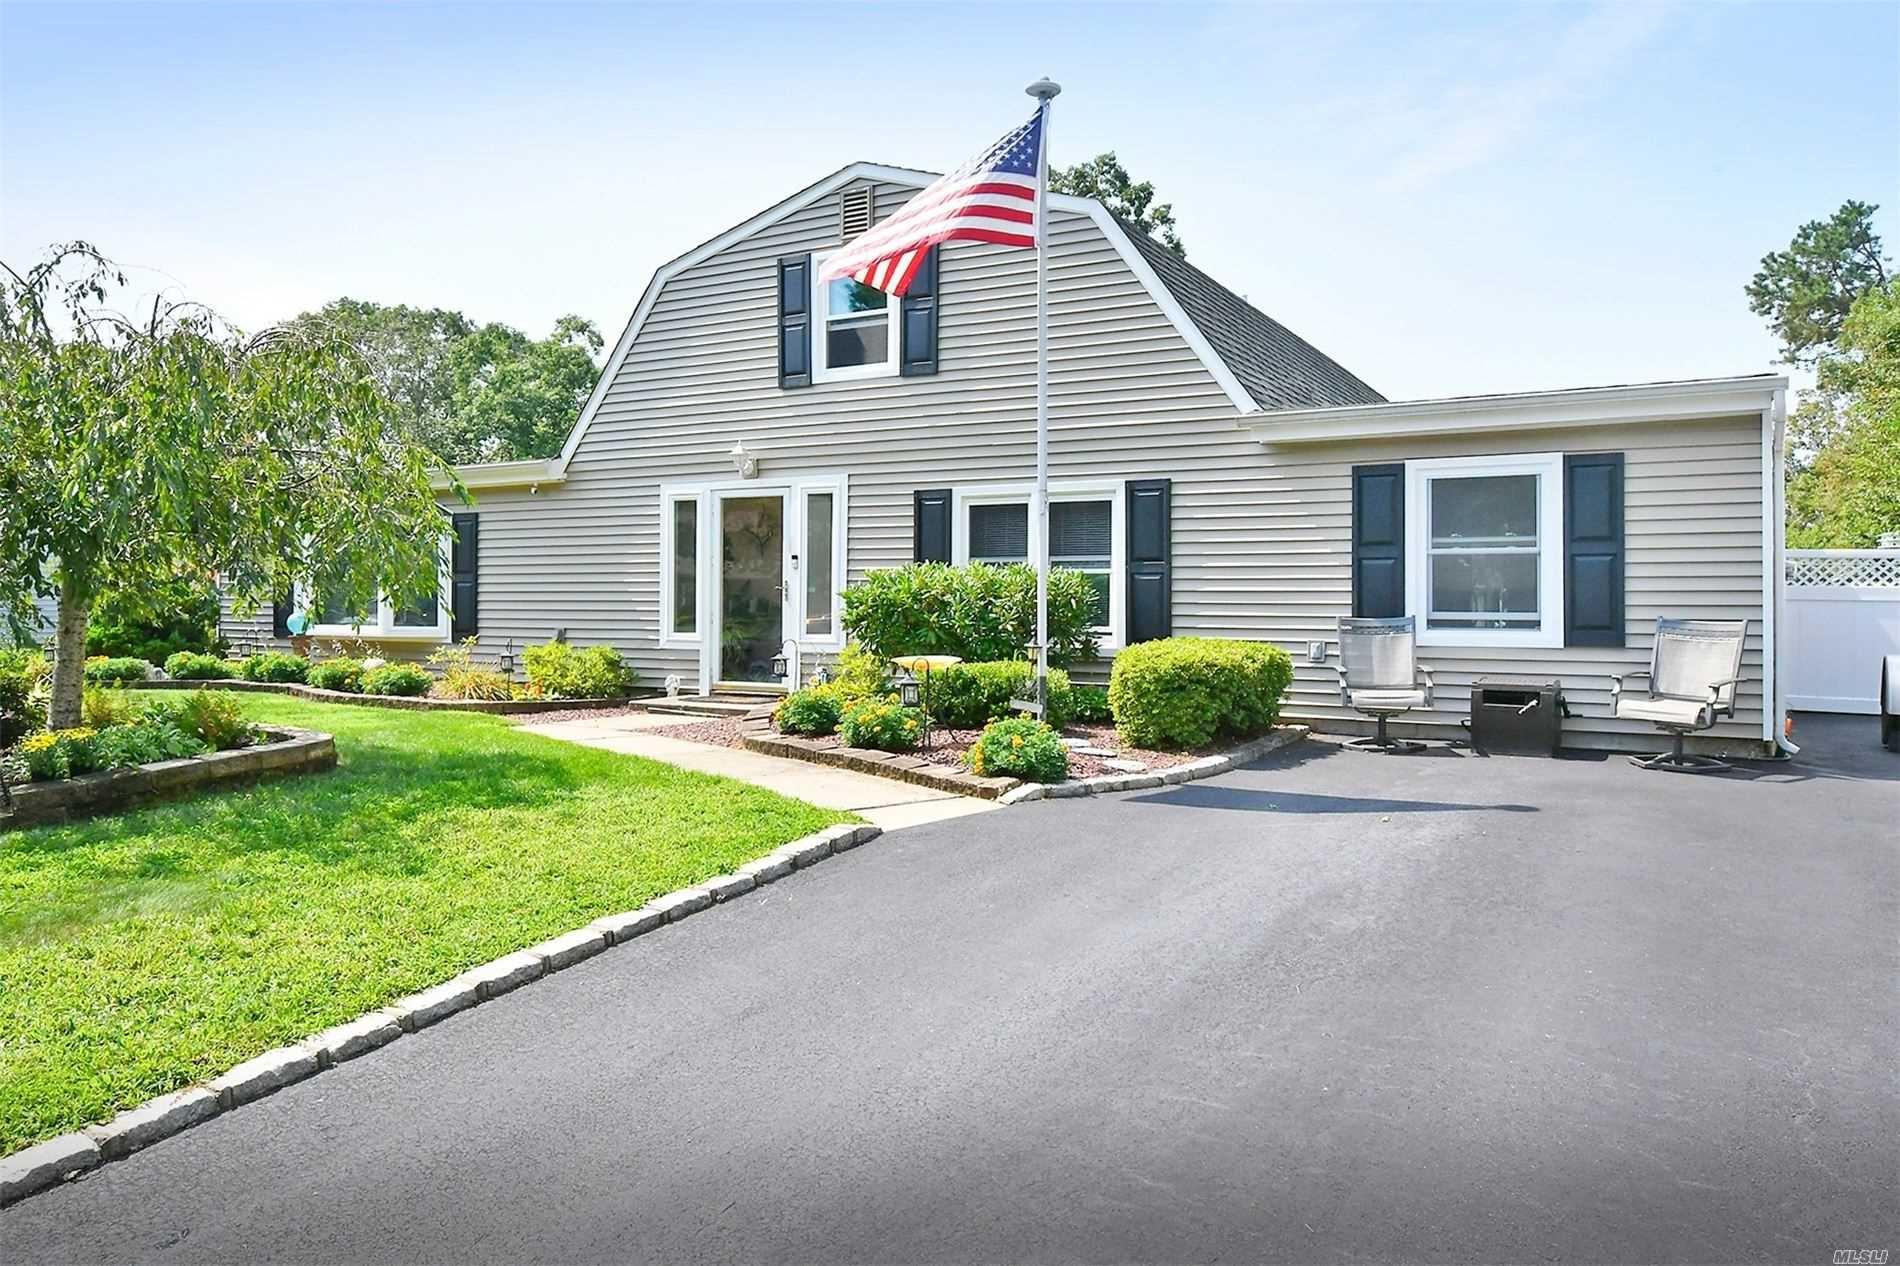 10 Lacebark Lane, Medford, NY 11763 - MLS#: 3248165